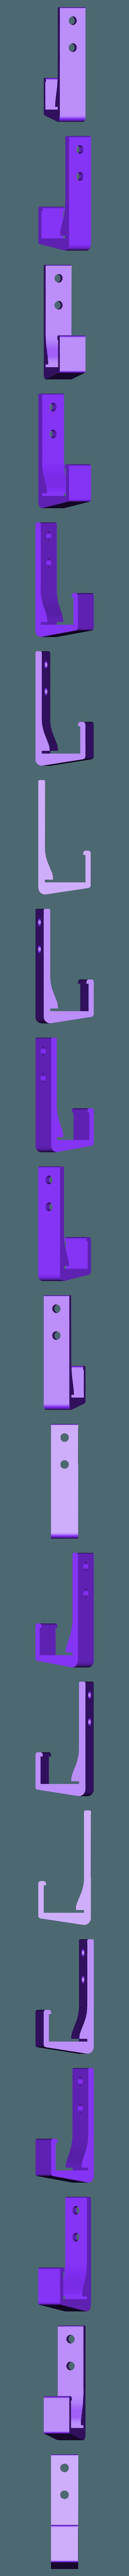 P-5.stl Download free STL file Laser Lifting Feet • 3D printing template, dancingchicken